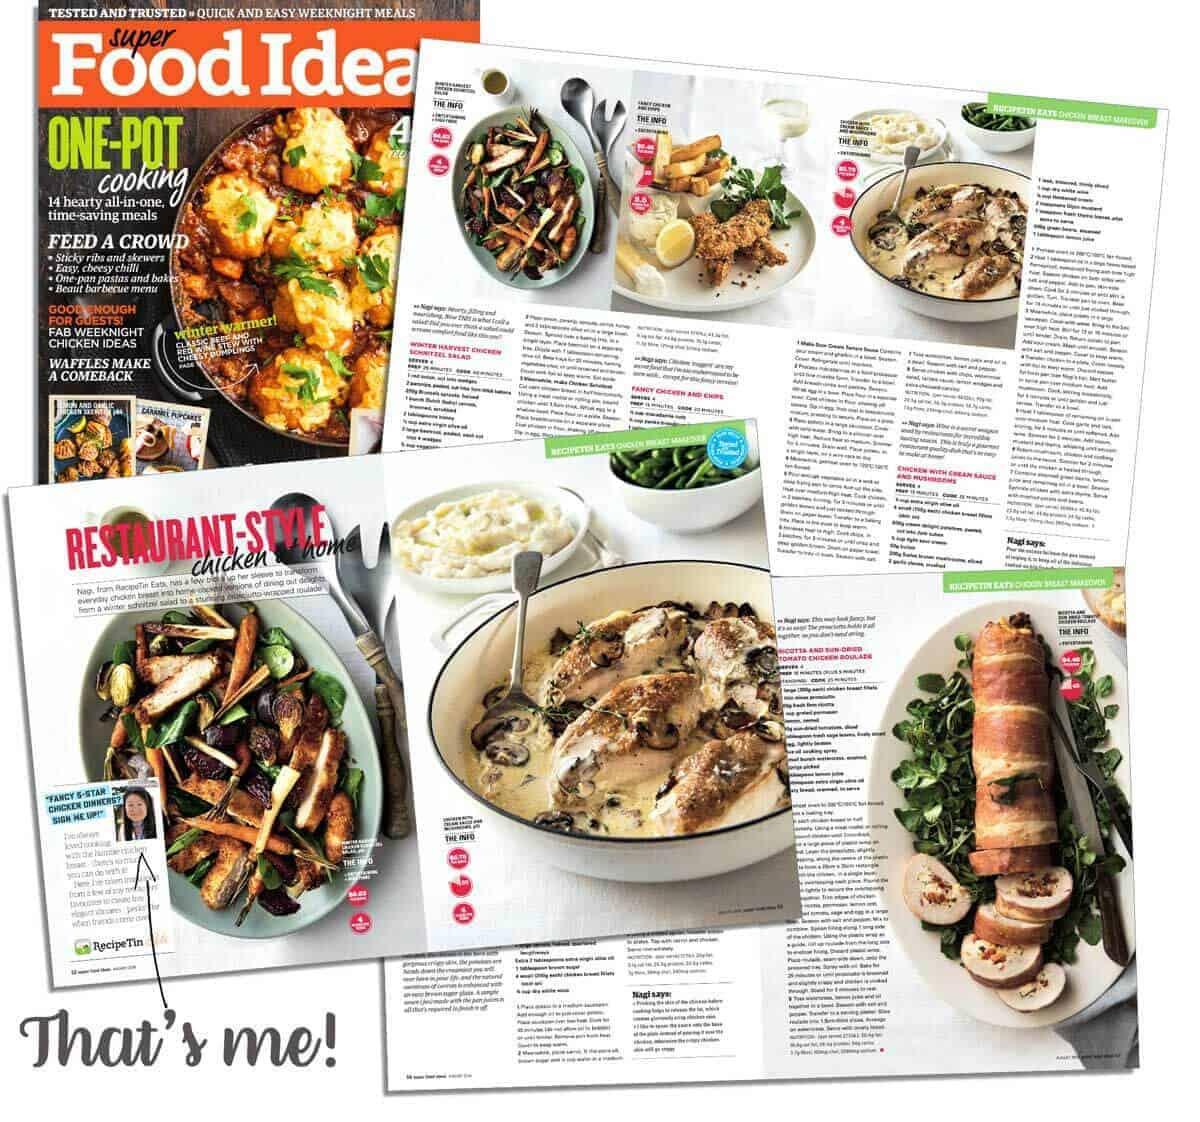 Super-Food-Ideas-Chicken Breast Feature